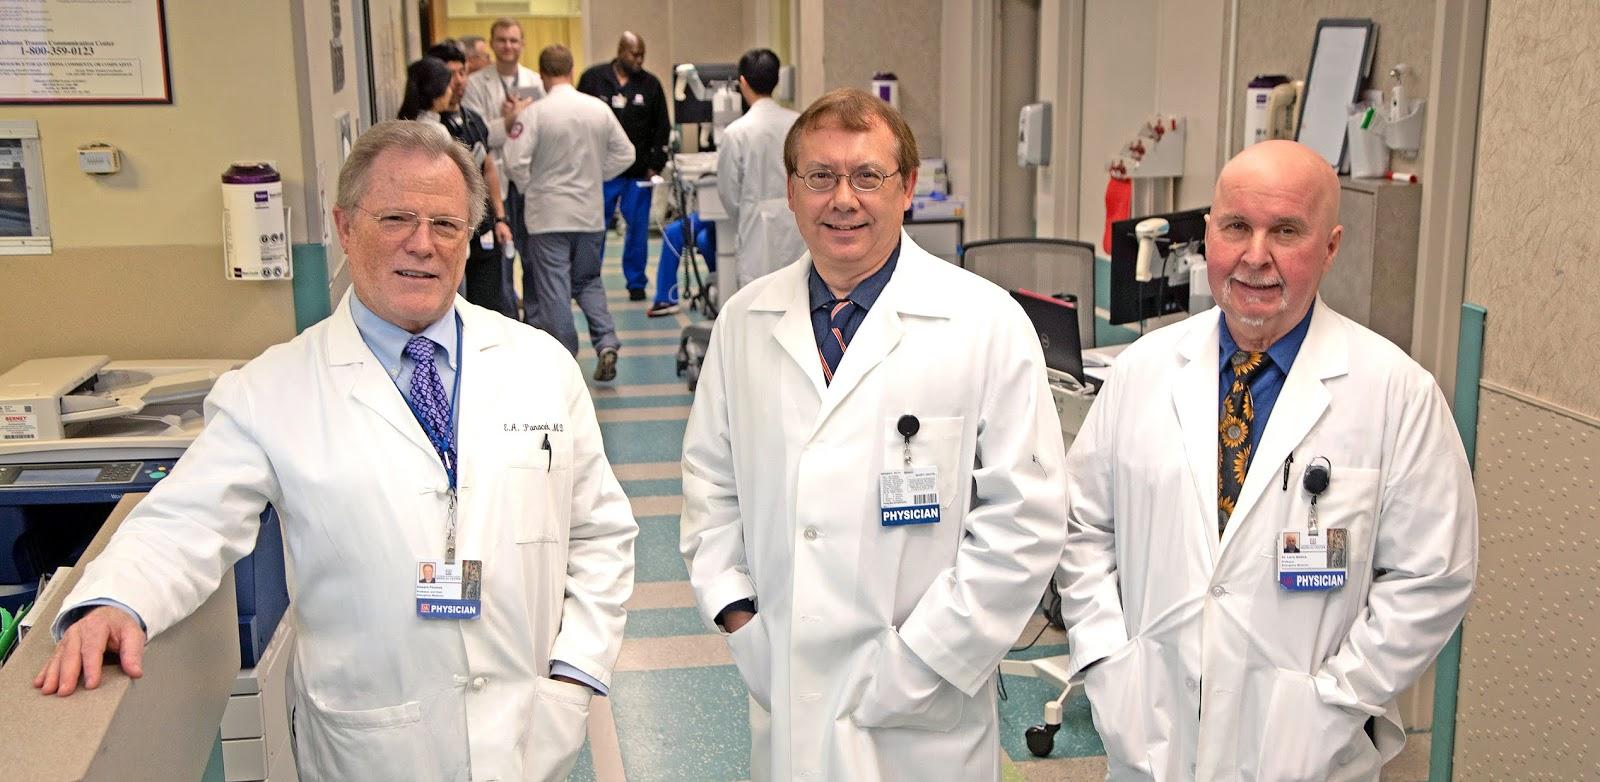 Med School Watercooler: USA College of Medicine Establishes New